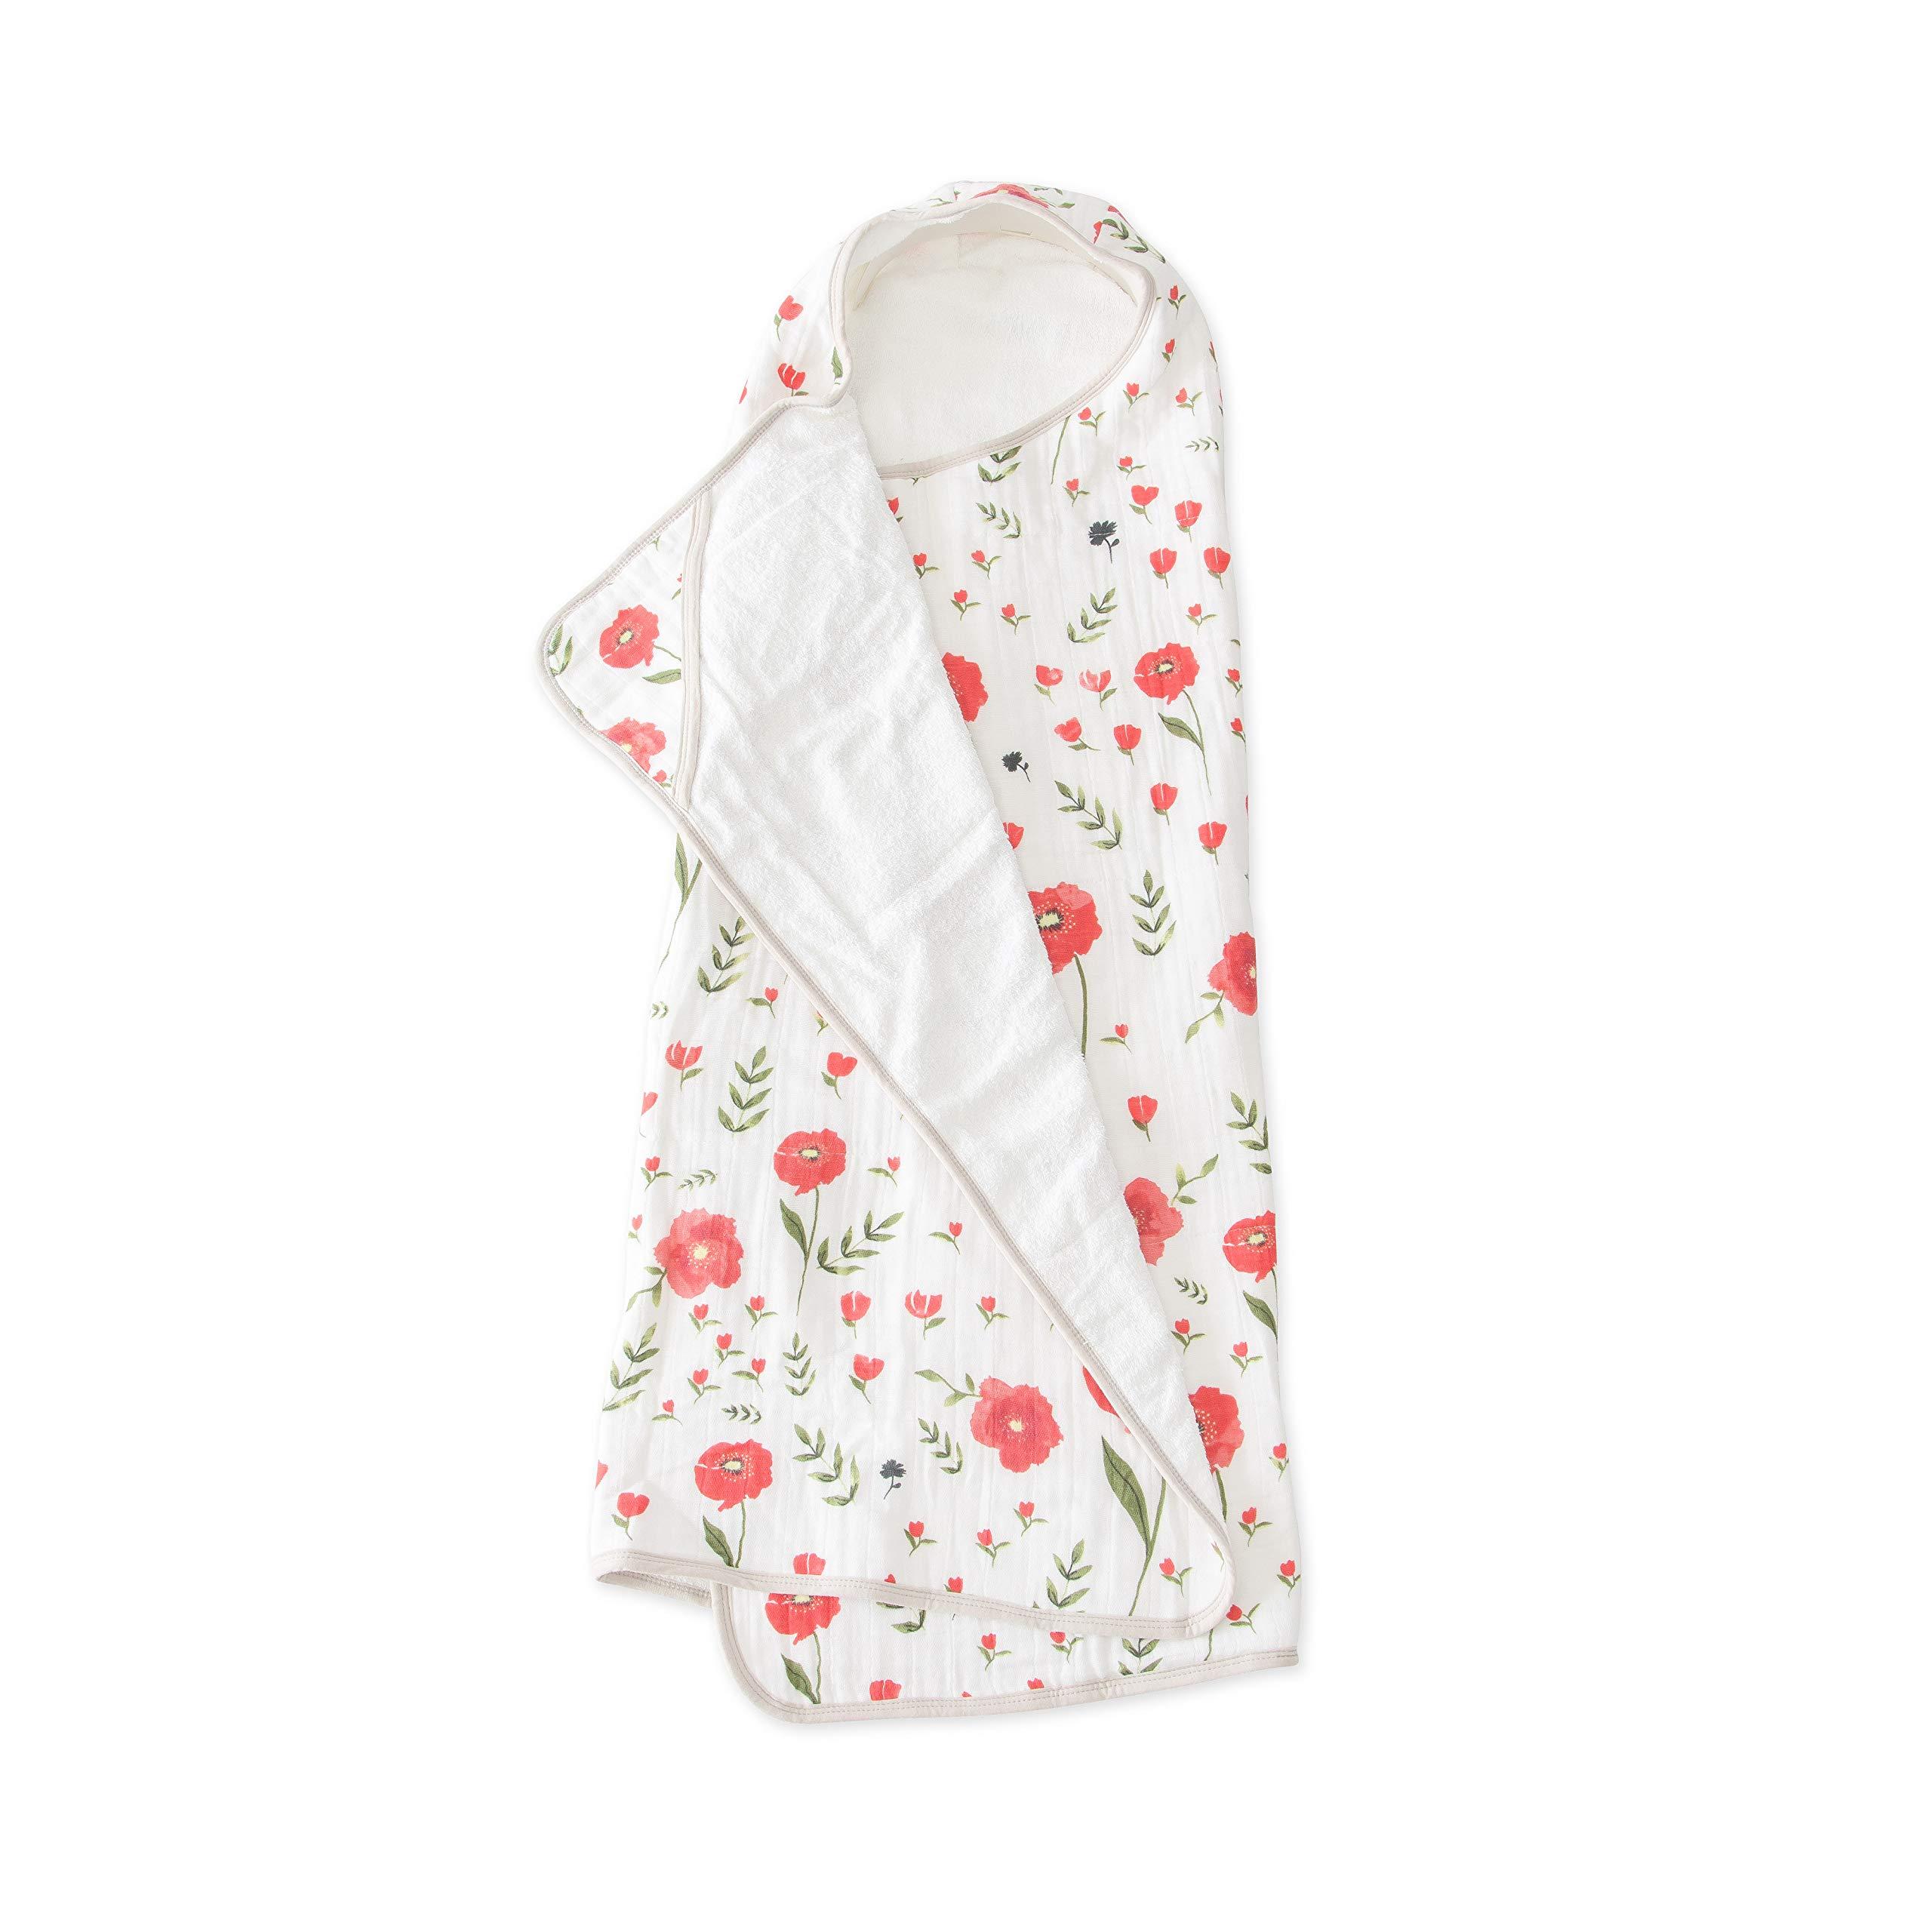 Little Unicorn Large Cotton Hooded Towel - Summer Poppy by Little Unicorn